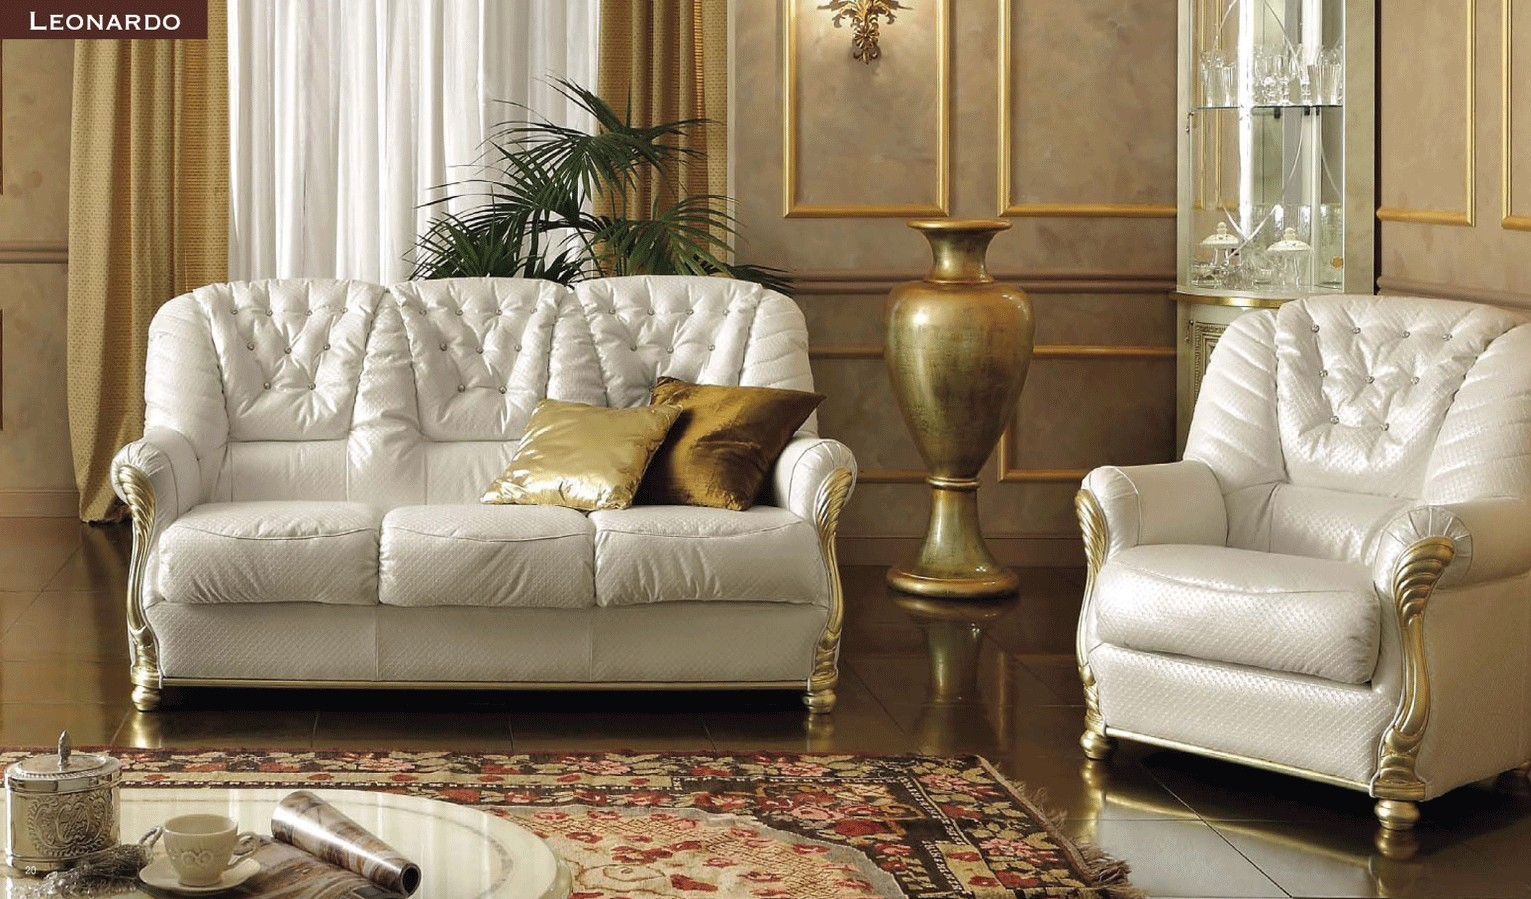 Leonardo Italian Living Room Set with Swarovski